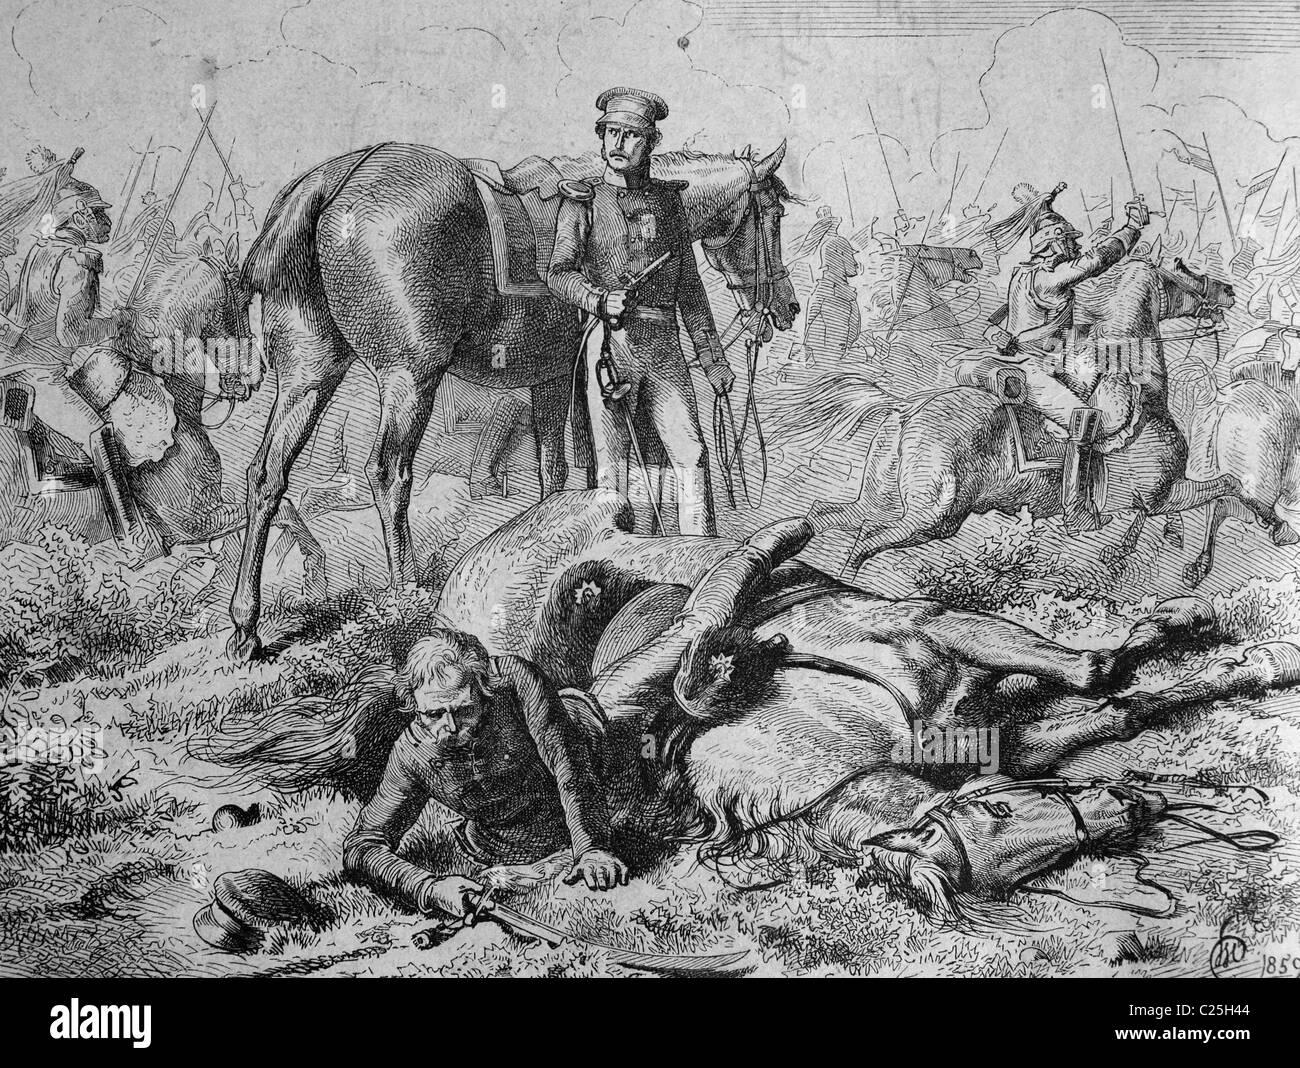 Gebhard Leberecht von Bluecher's fall at the battle of Ligny, 1815, historic illustration, 1877 - Stock Image